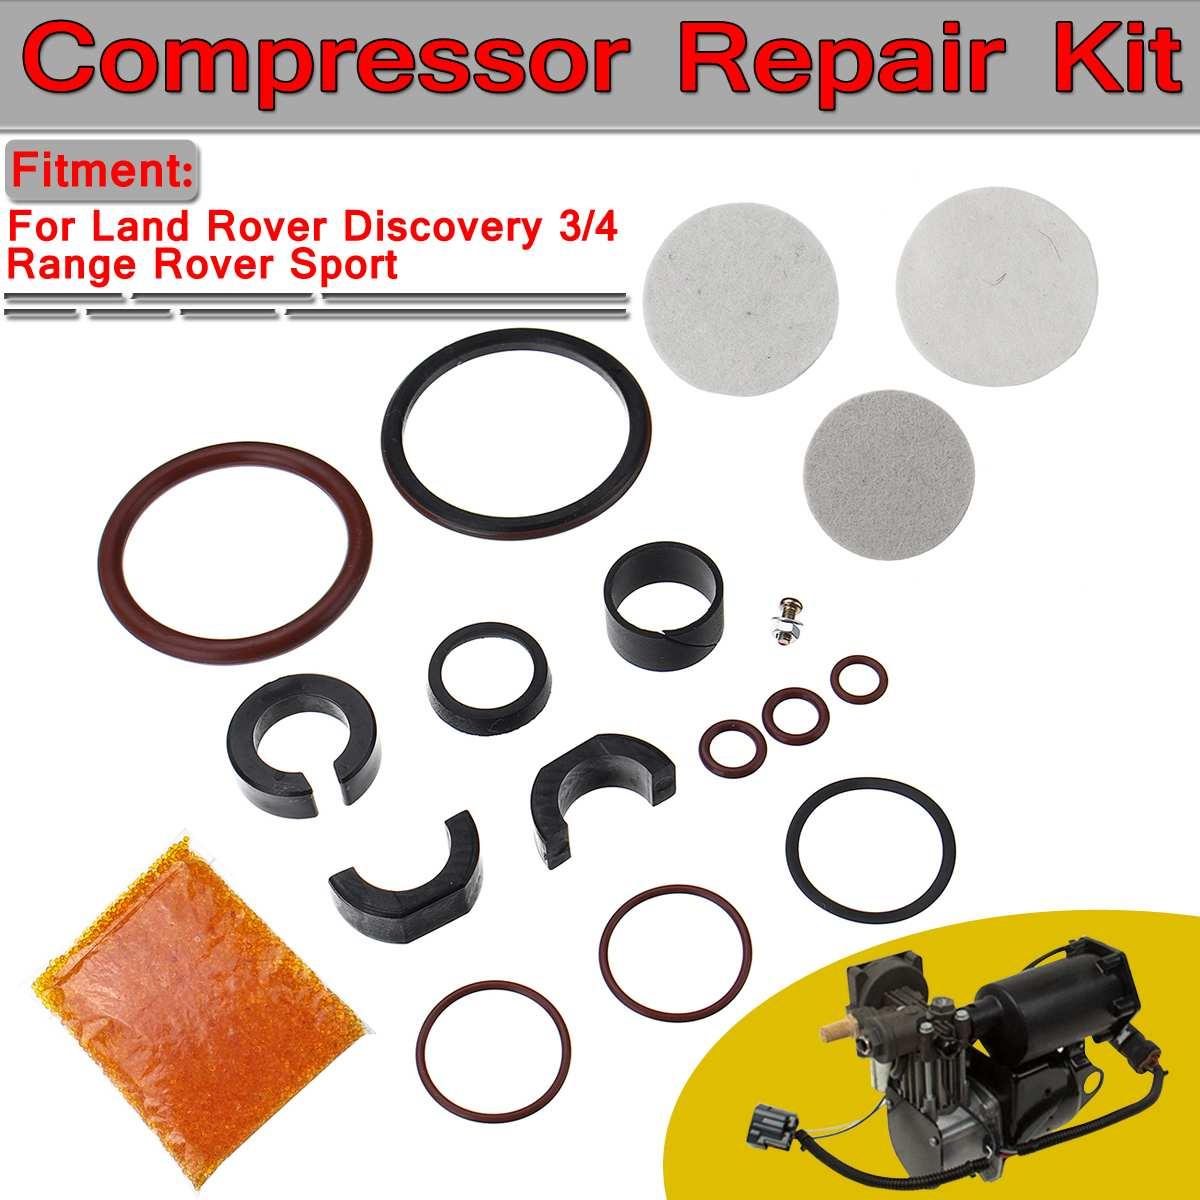 Kit de reparación de compresor A/C de suspensión neumática de coche para Land Rover Discovery 3/4 Range Rover Sport RQG000017 RQG000018 rqg0019